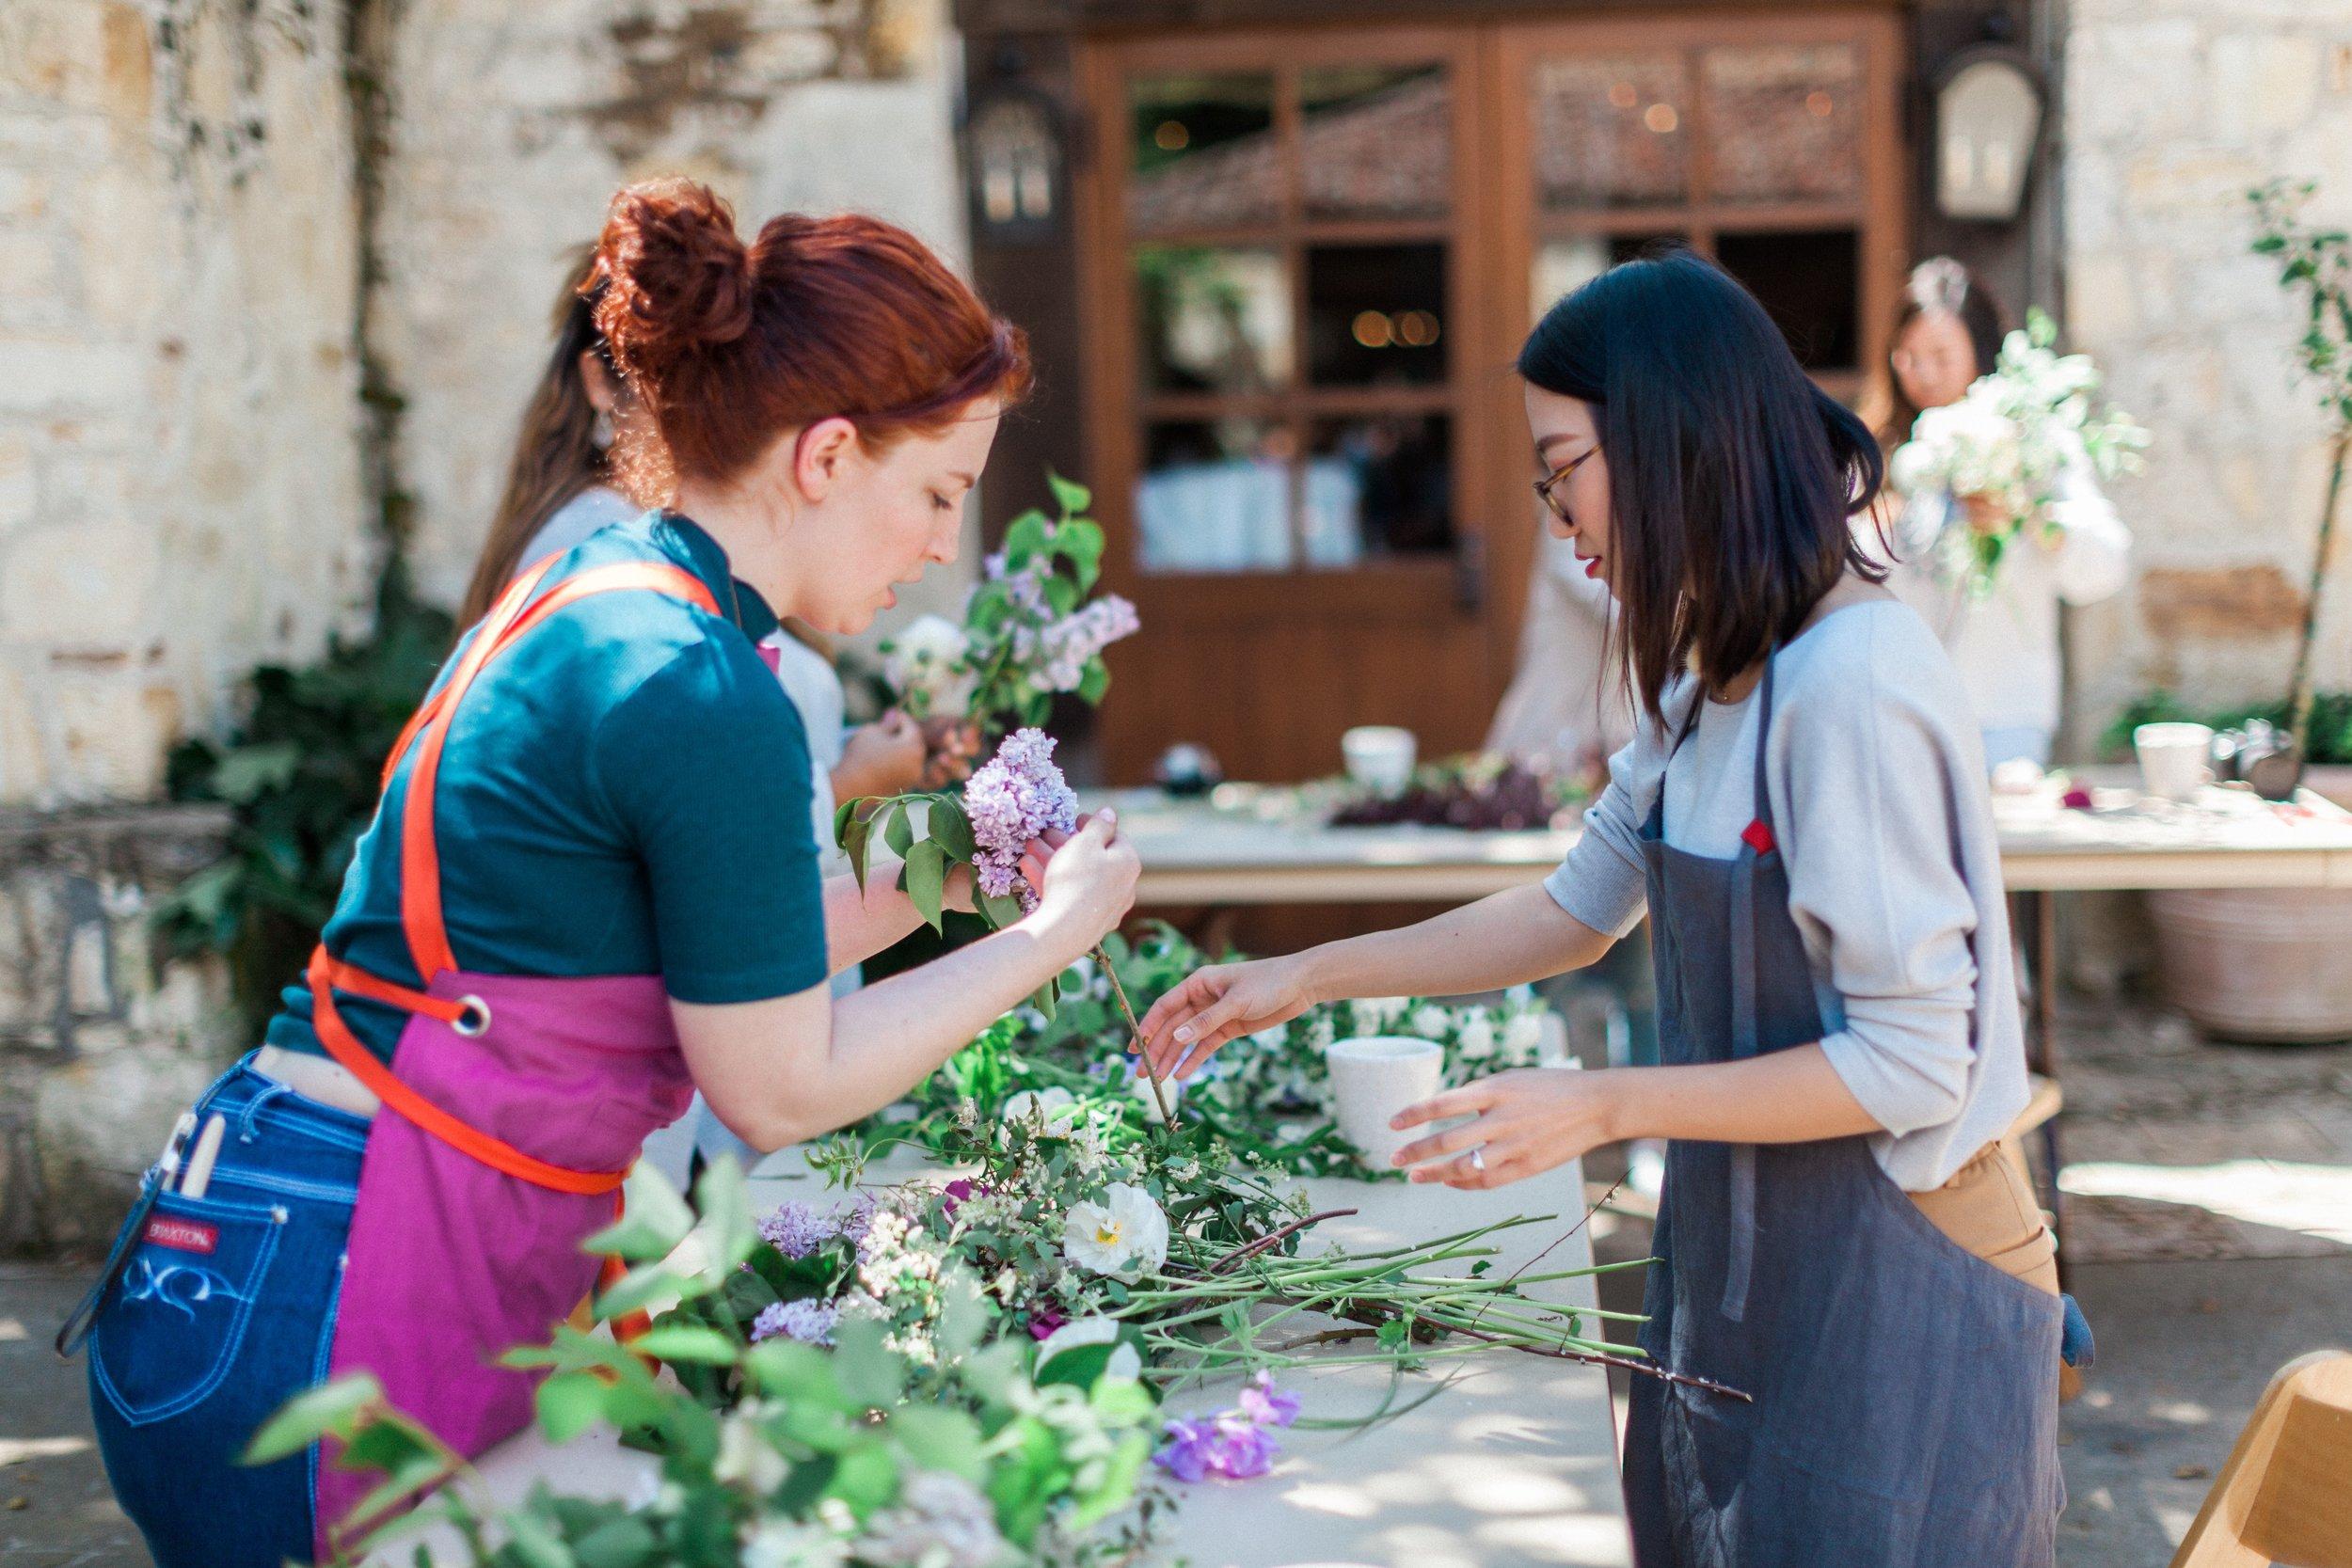 Ragi-and-Amanda-Bloom-Workshop-Carmel-269.jpg